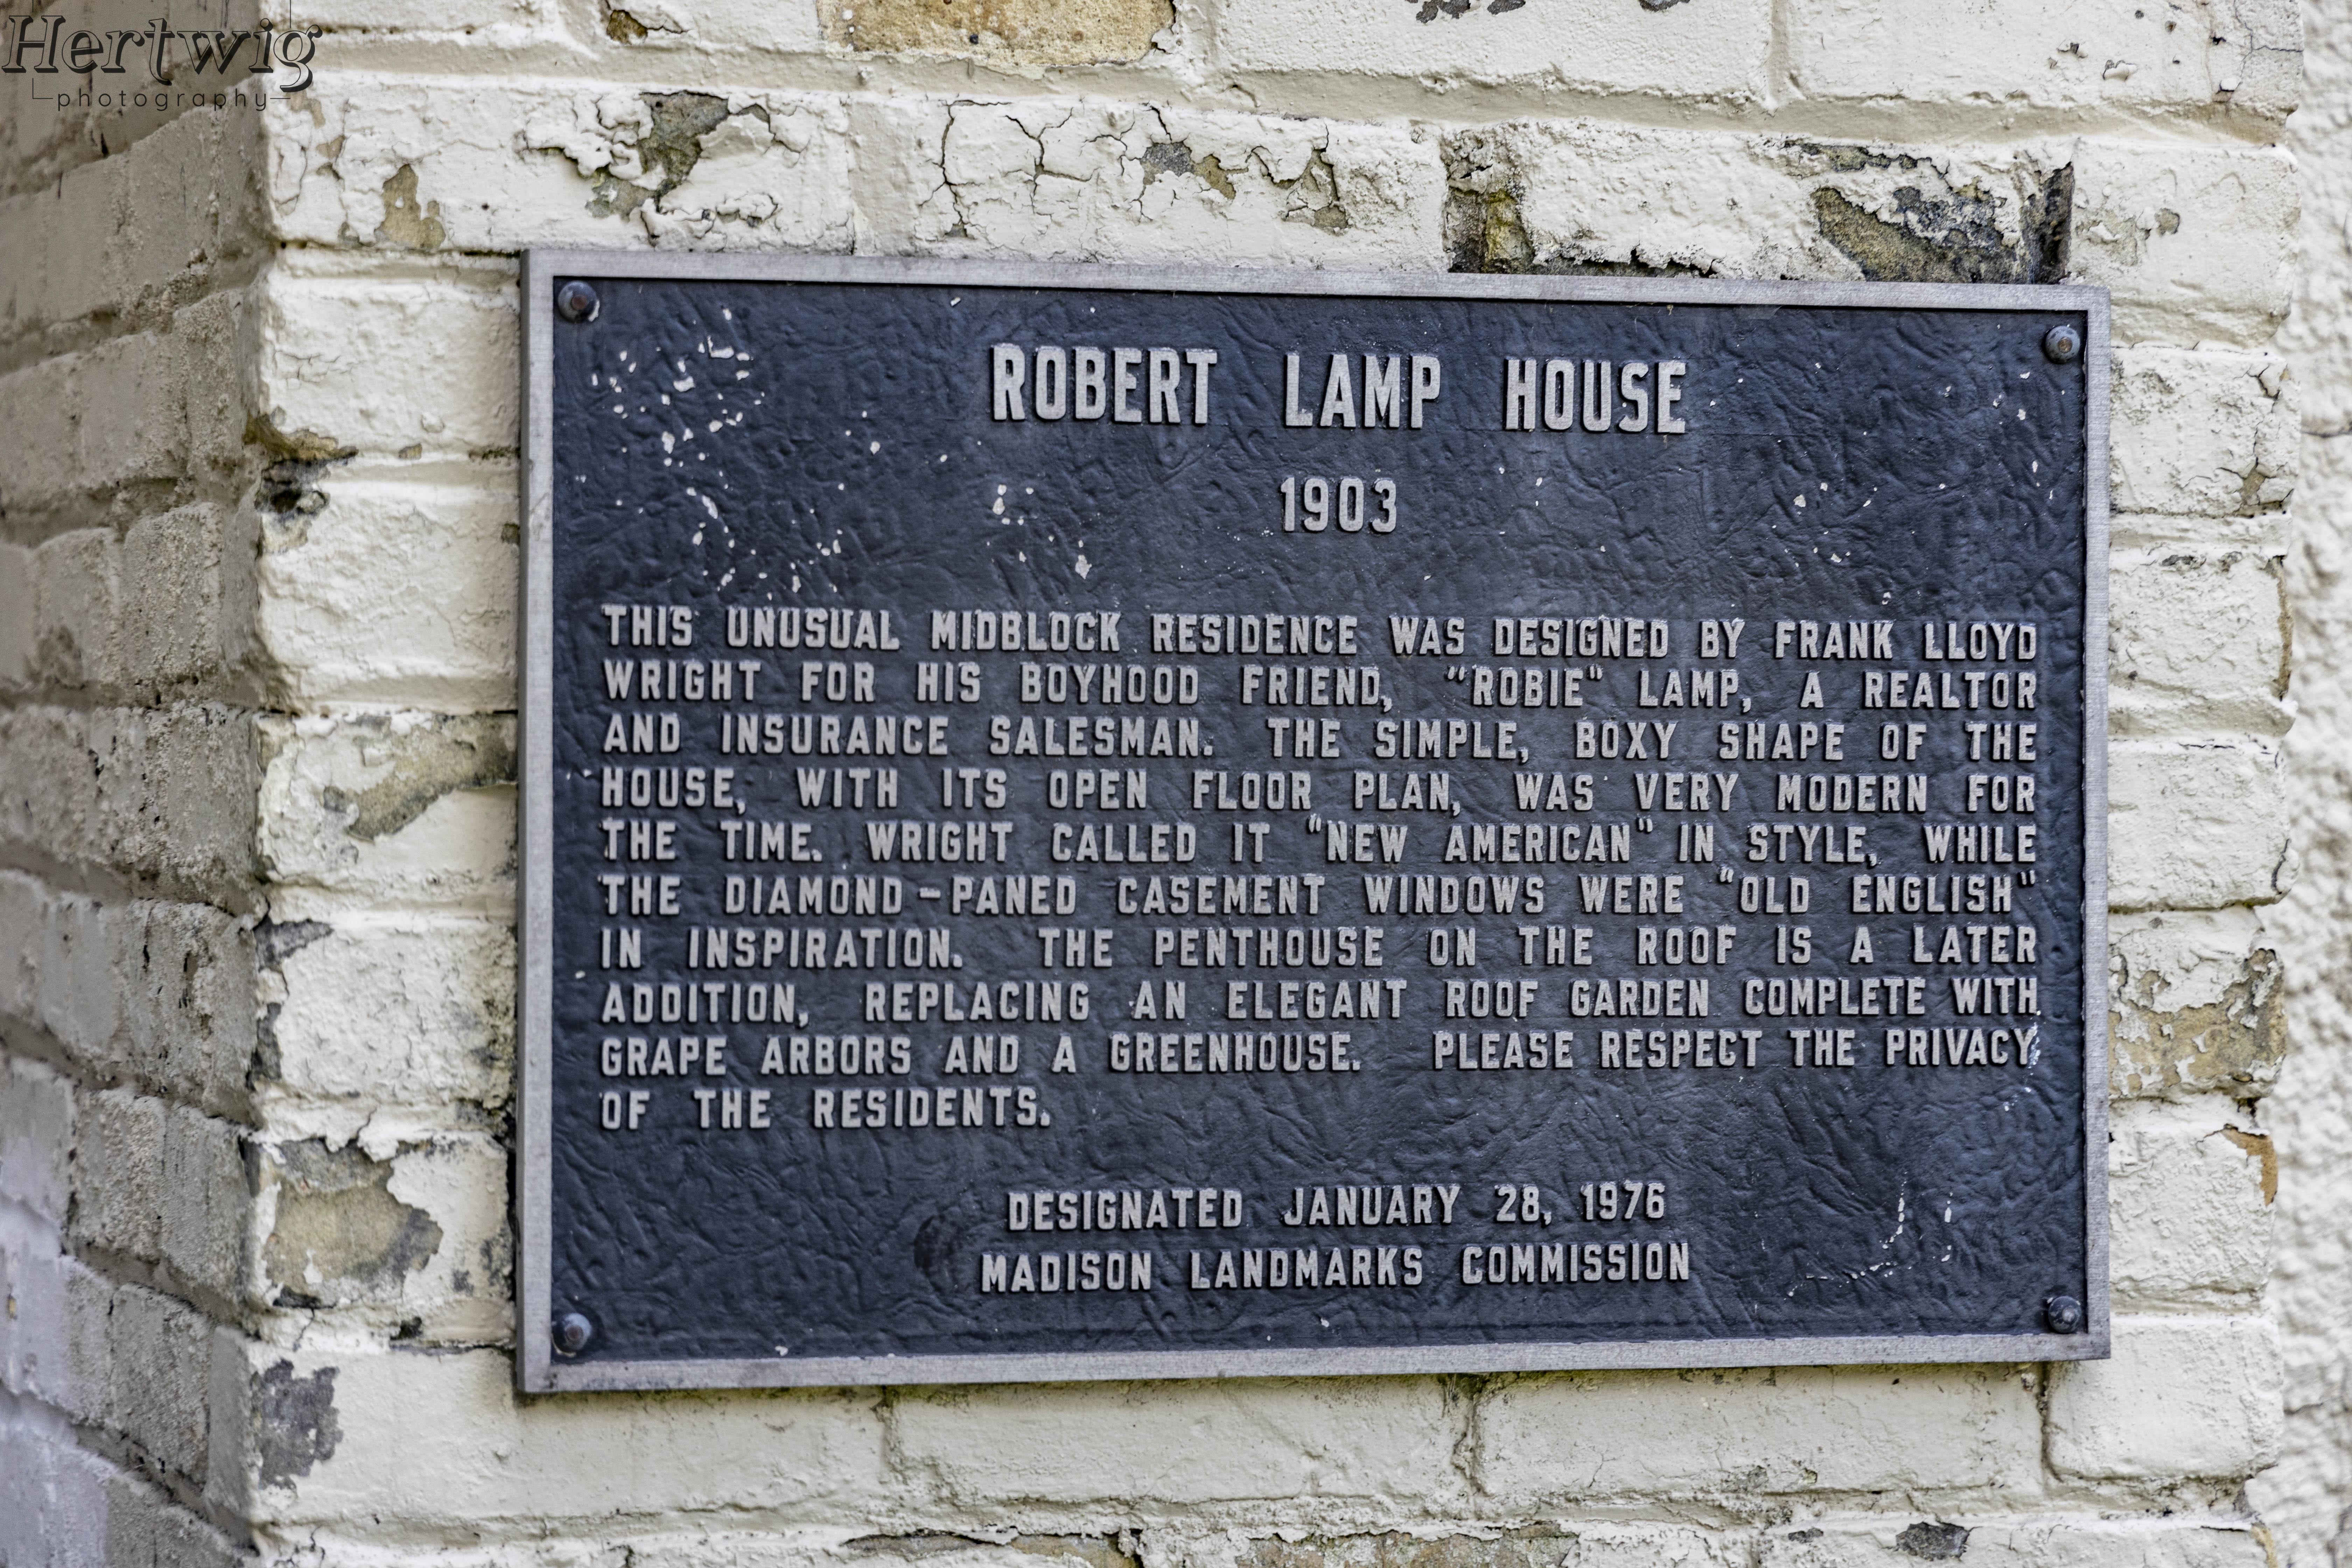 Robert Lamp House